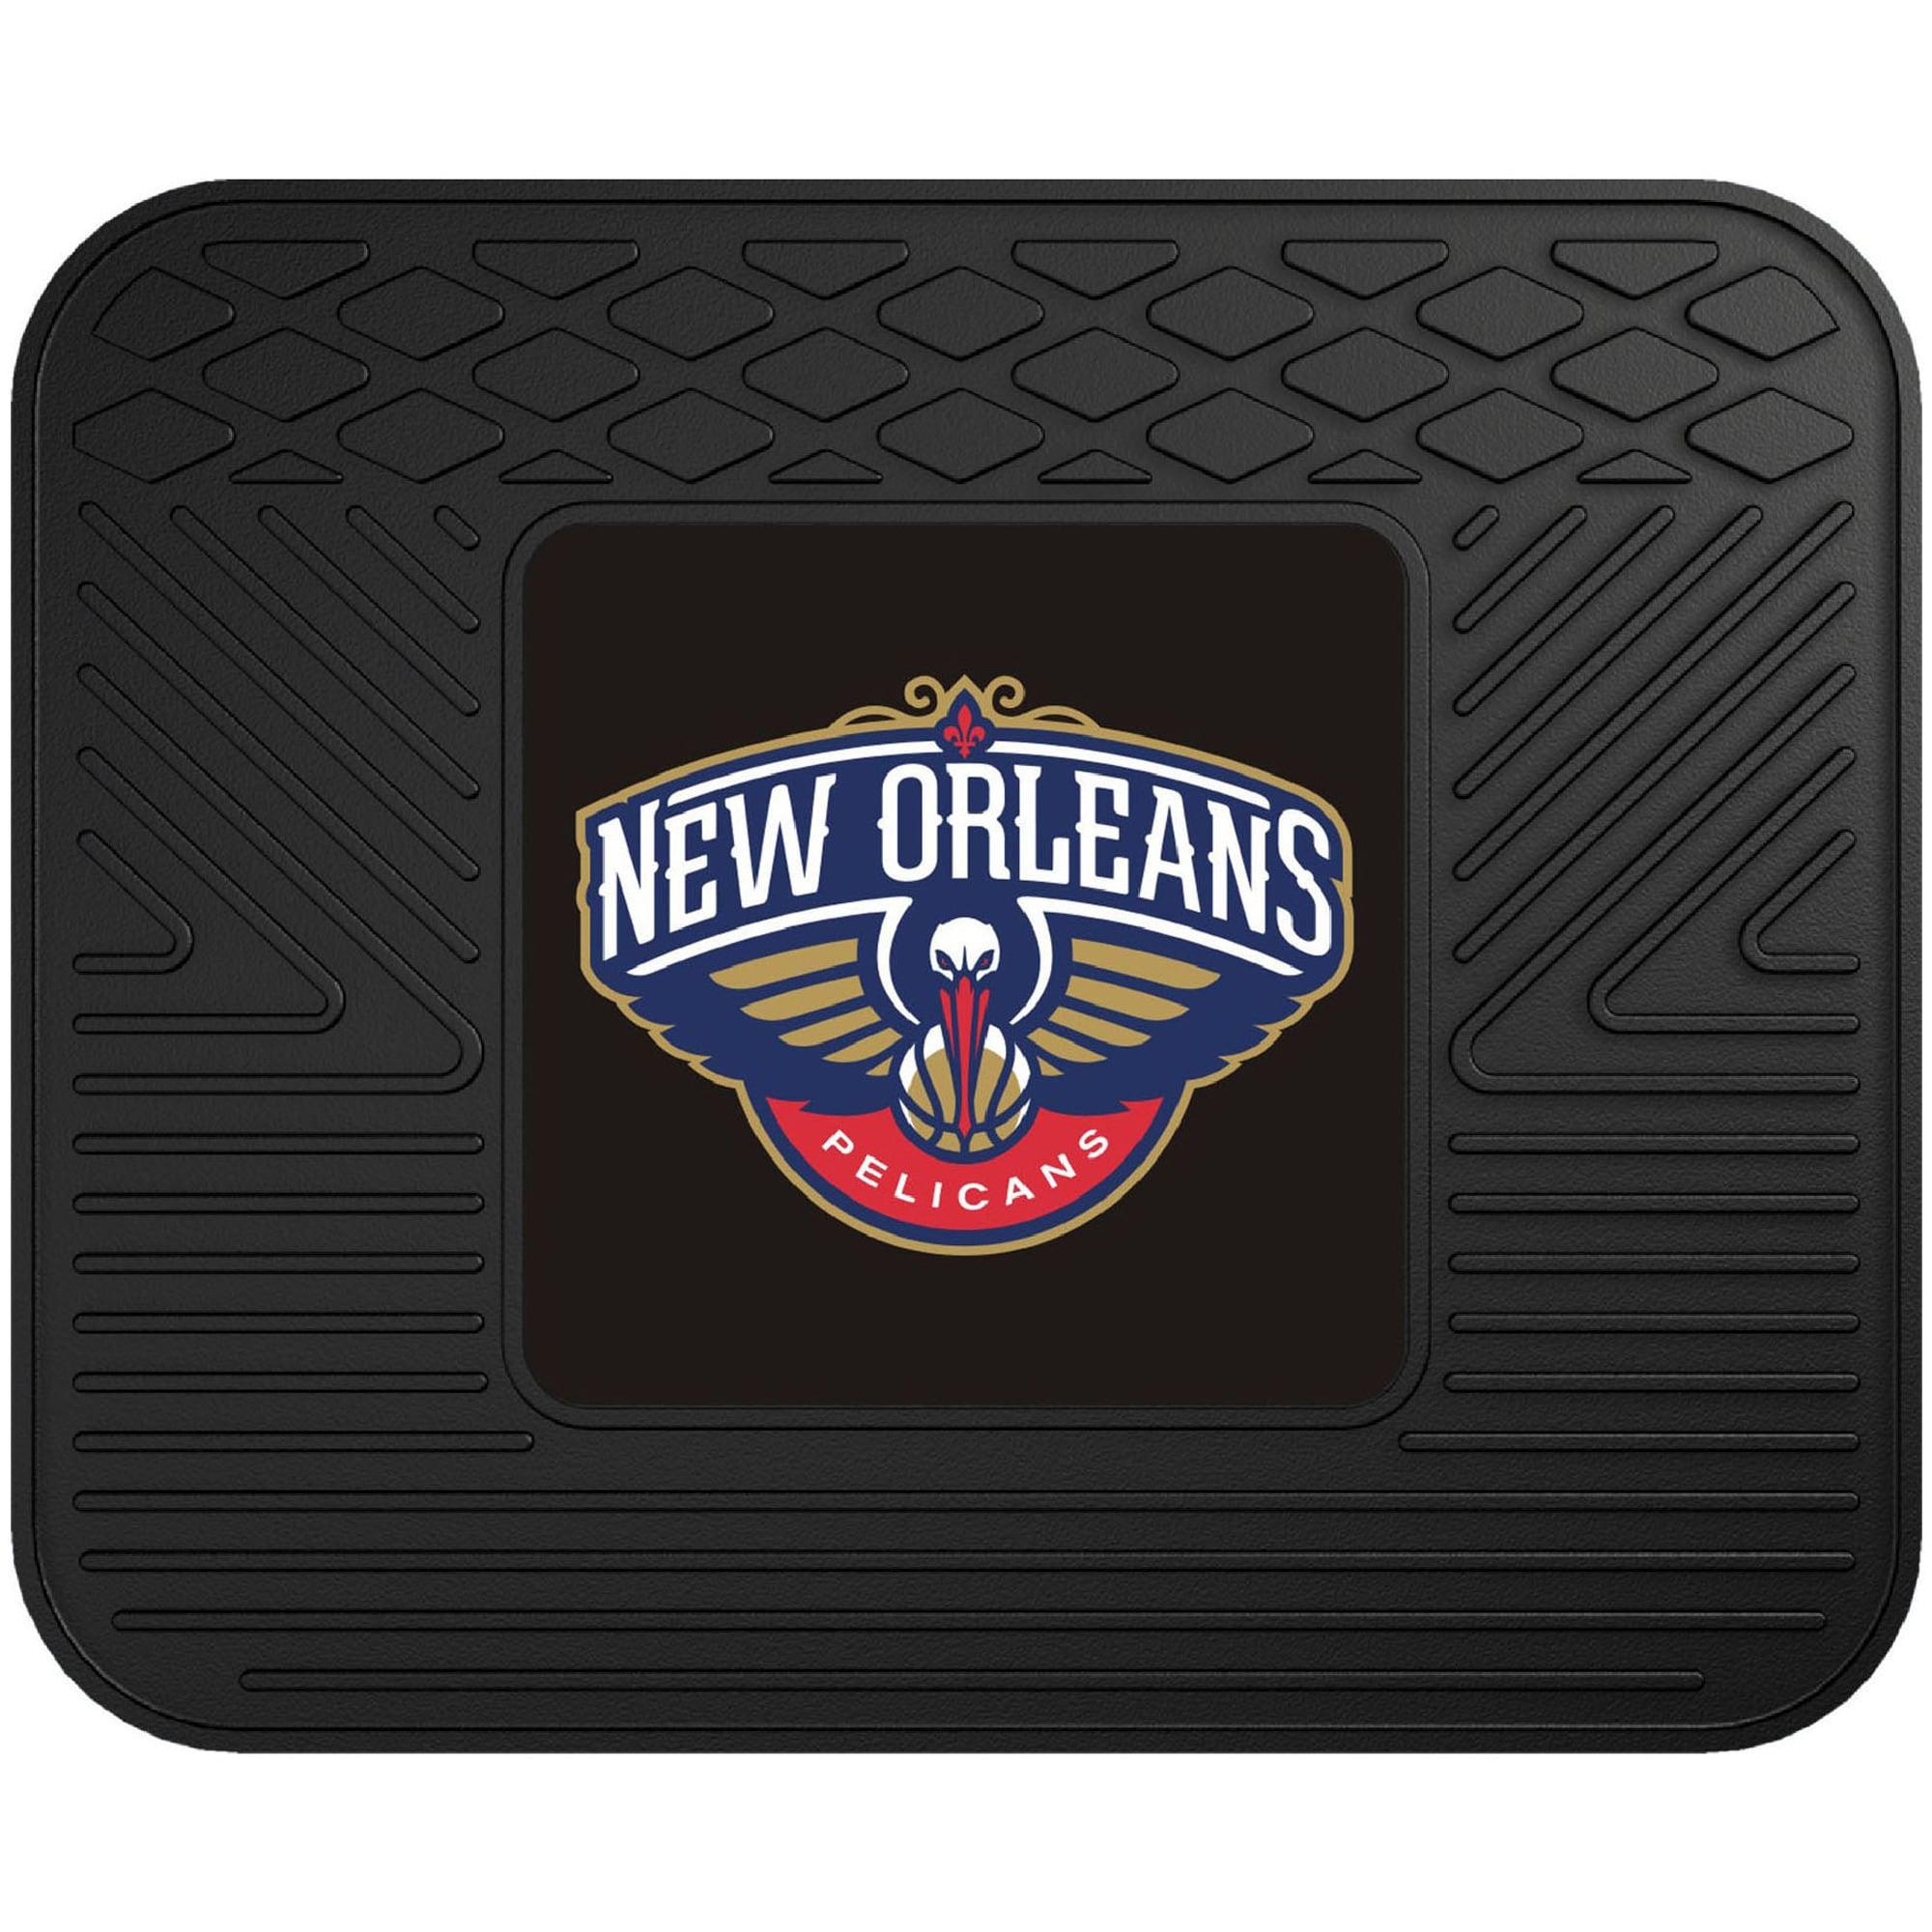 "New Orleans Pelicans 17"" x 14"" Utility Mat"